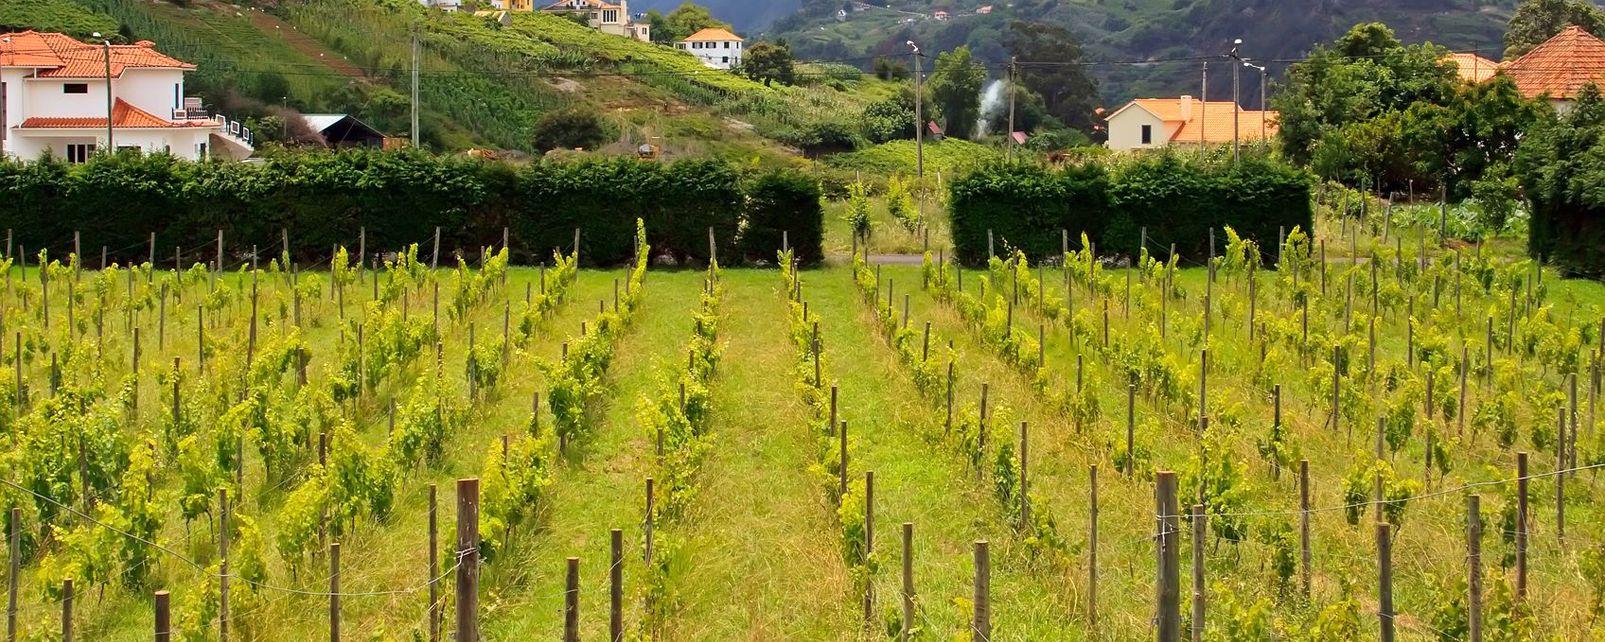 Precious bunches, Vines, The fauna and flora, Madeira